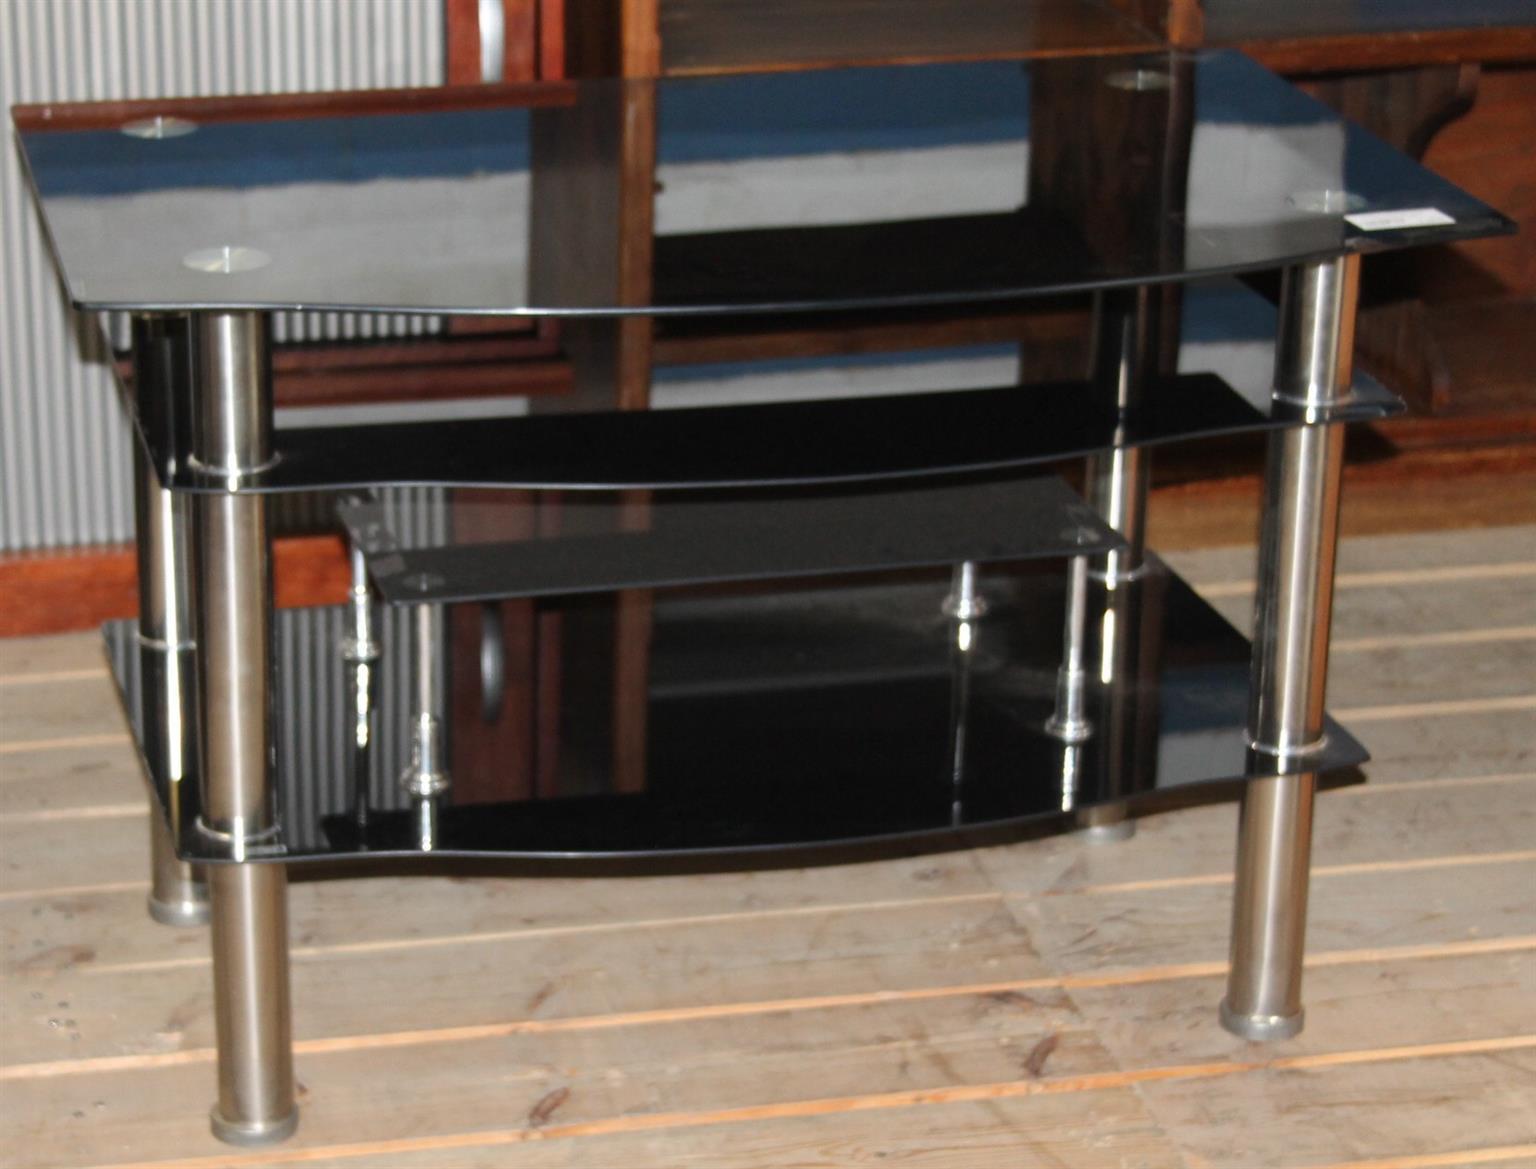 Coffee table S028225a  #Rosettenvillepawnshop